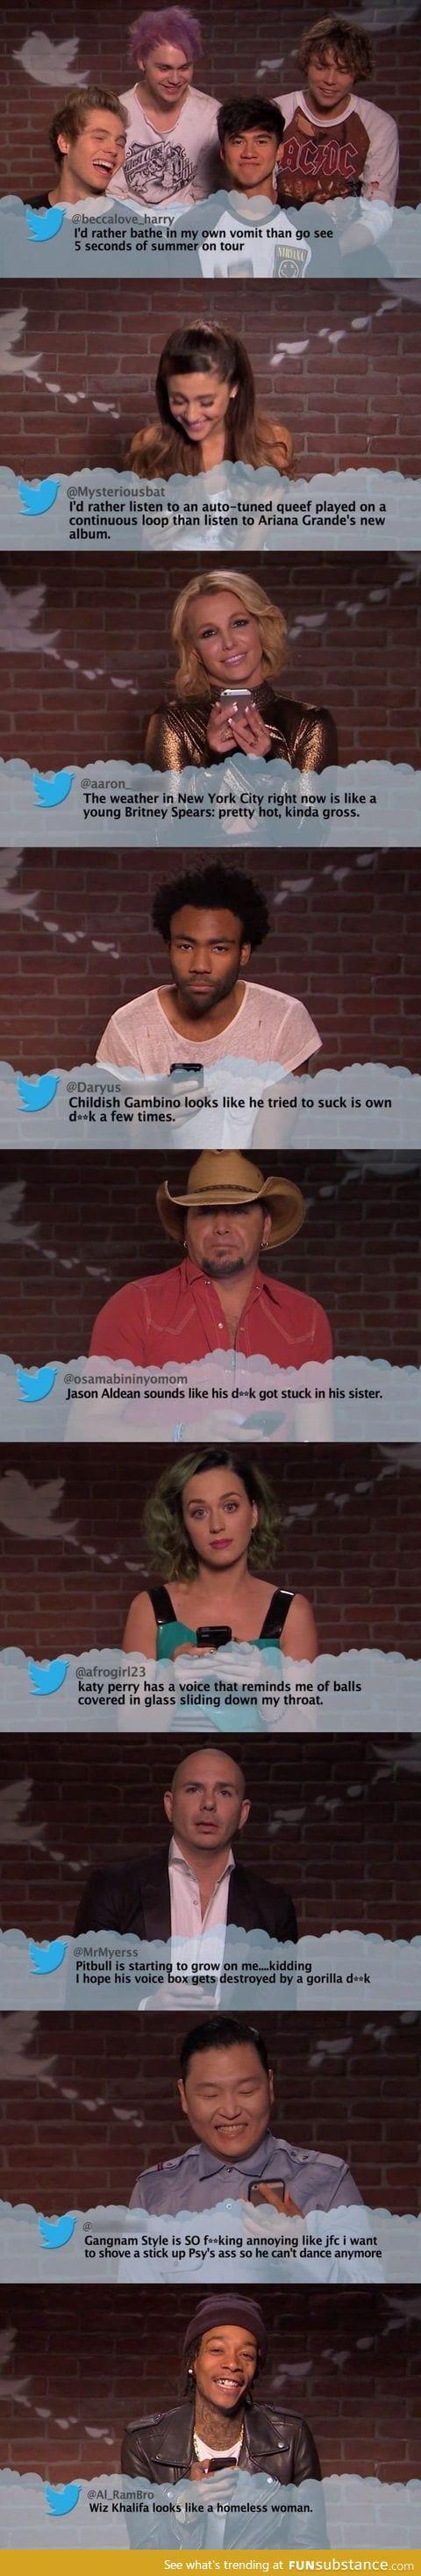 Music artists read mean Tweets